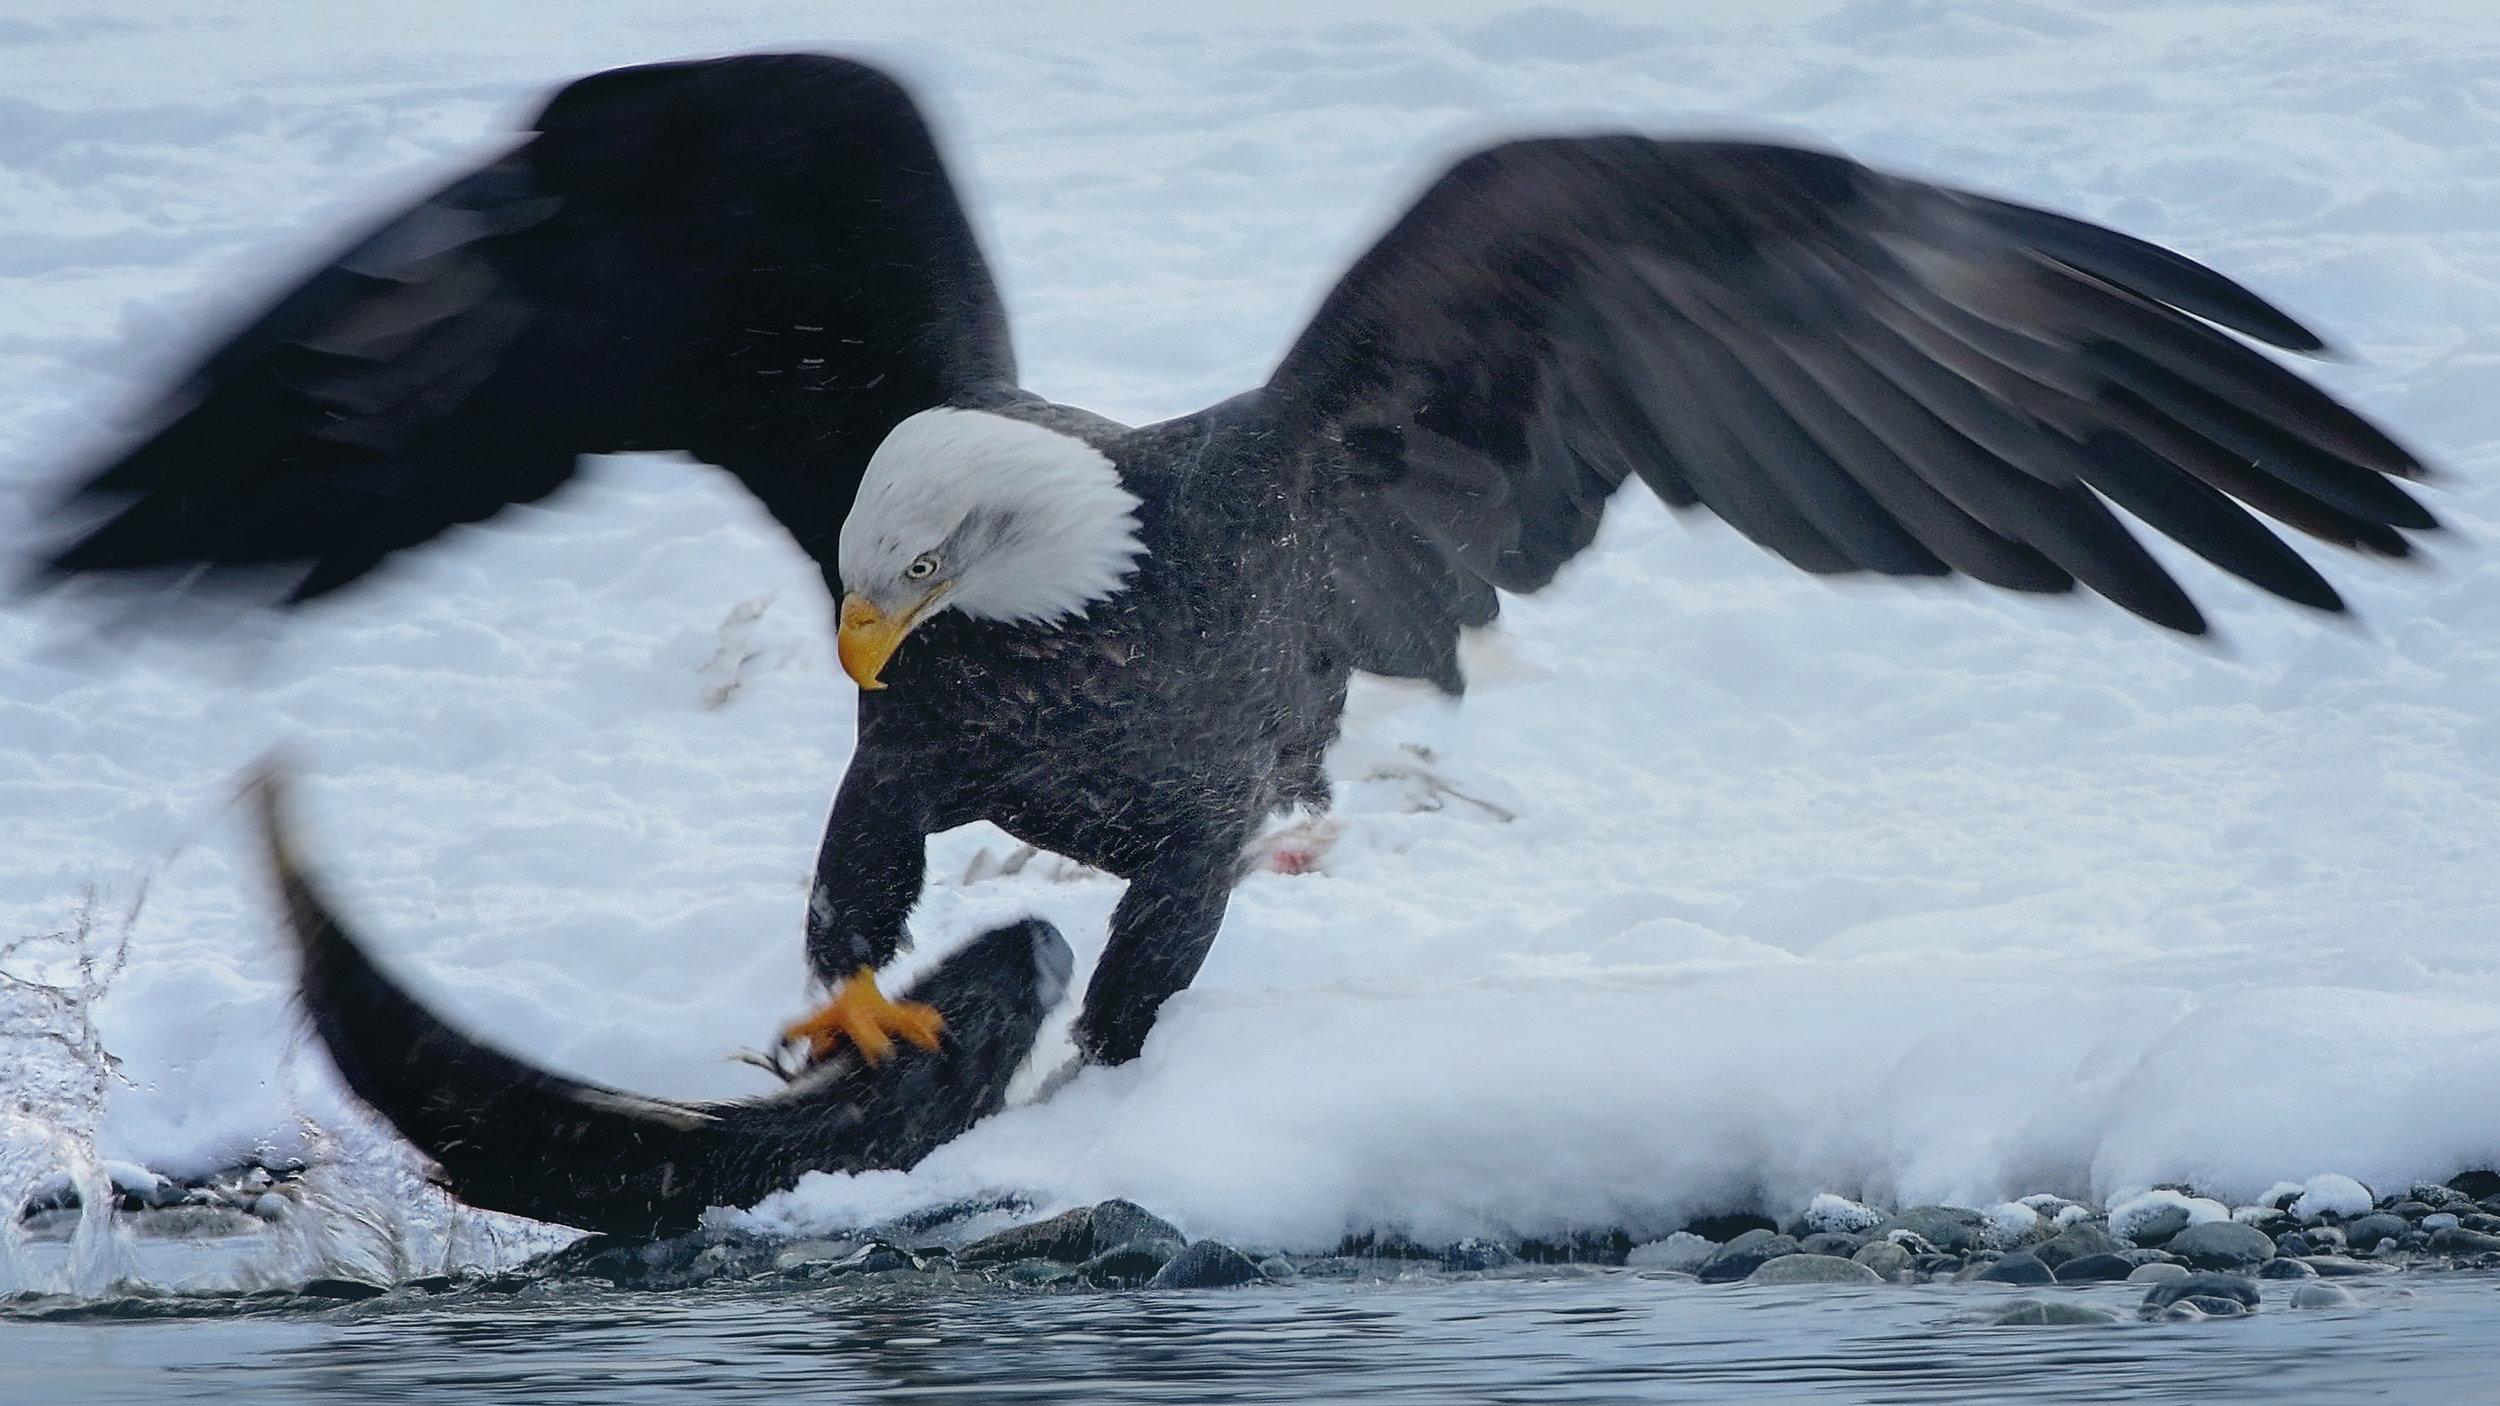 J. EaglePortfolio_Image_9_©BrianRiveraUncapher.jpg